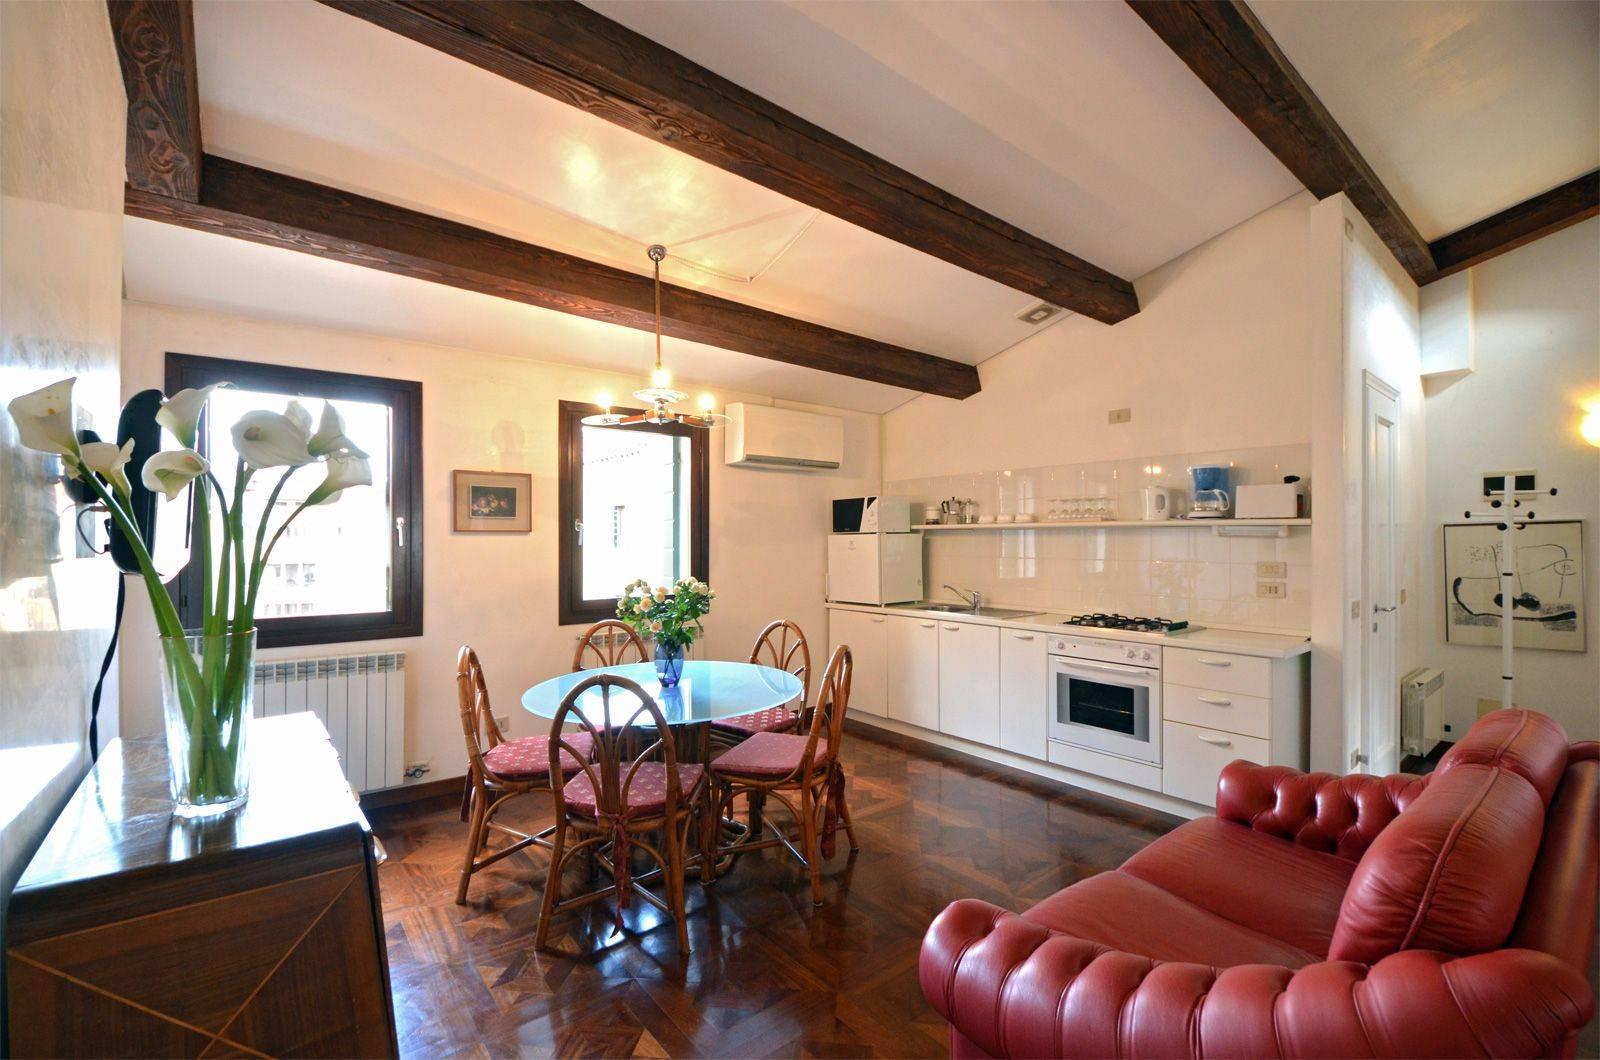 nice parquet flooring, wooden beams, interesting antiques...